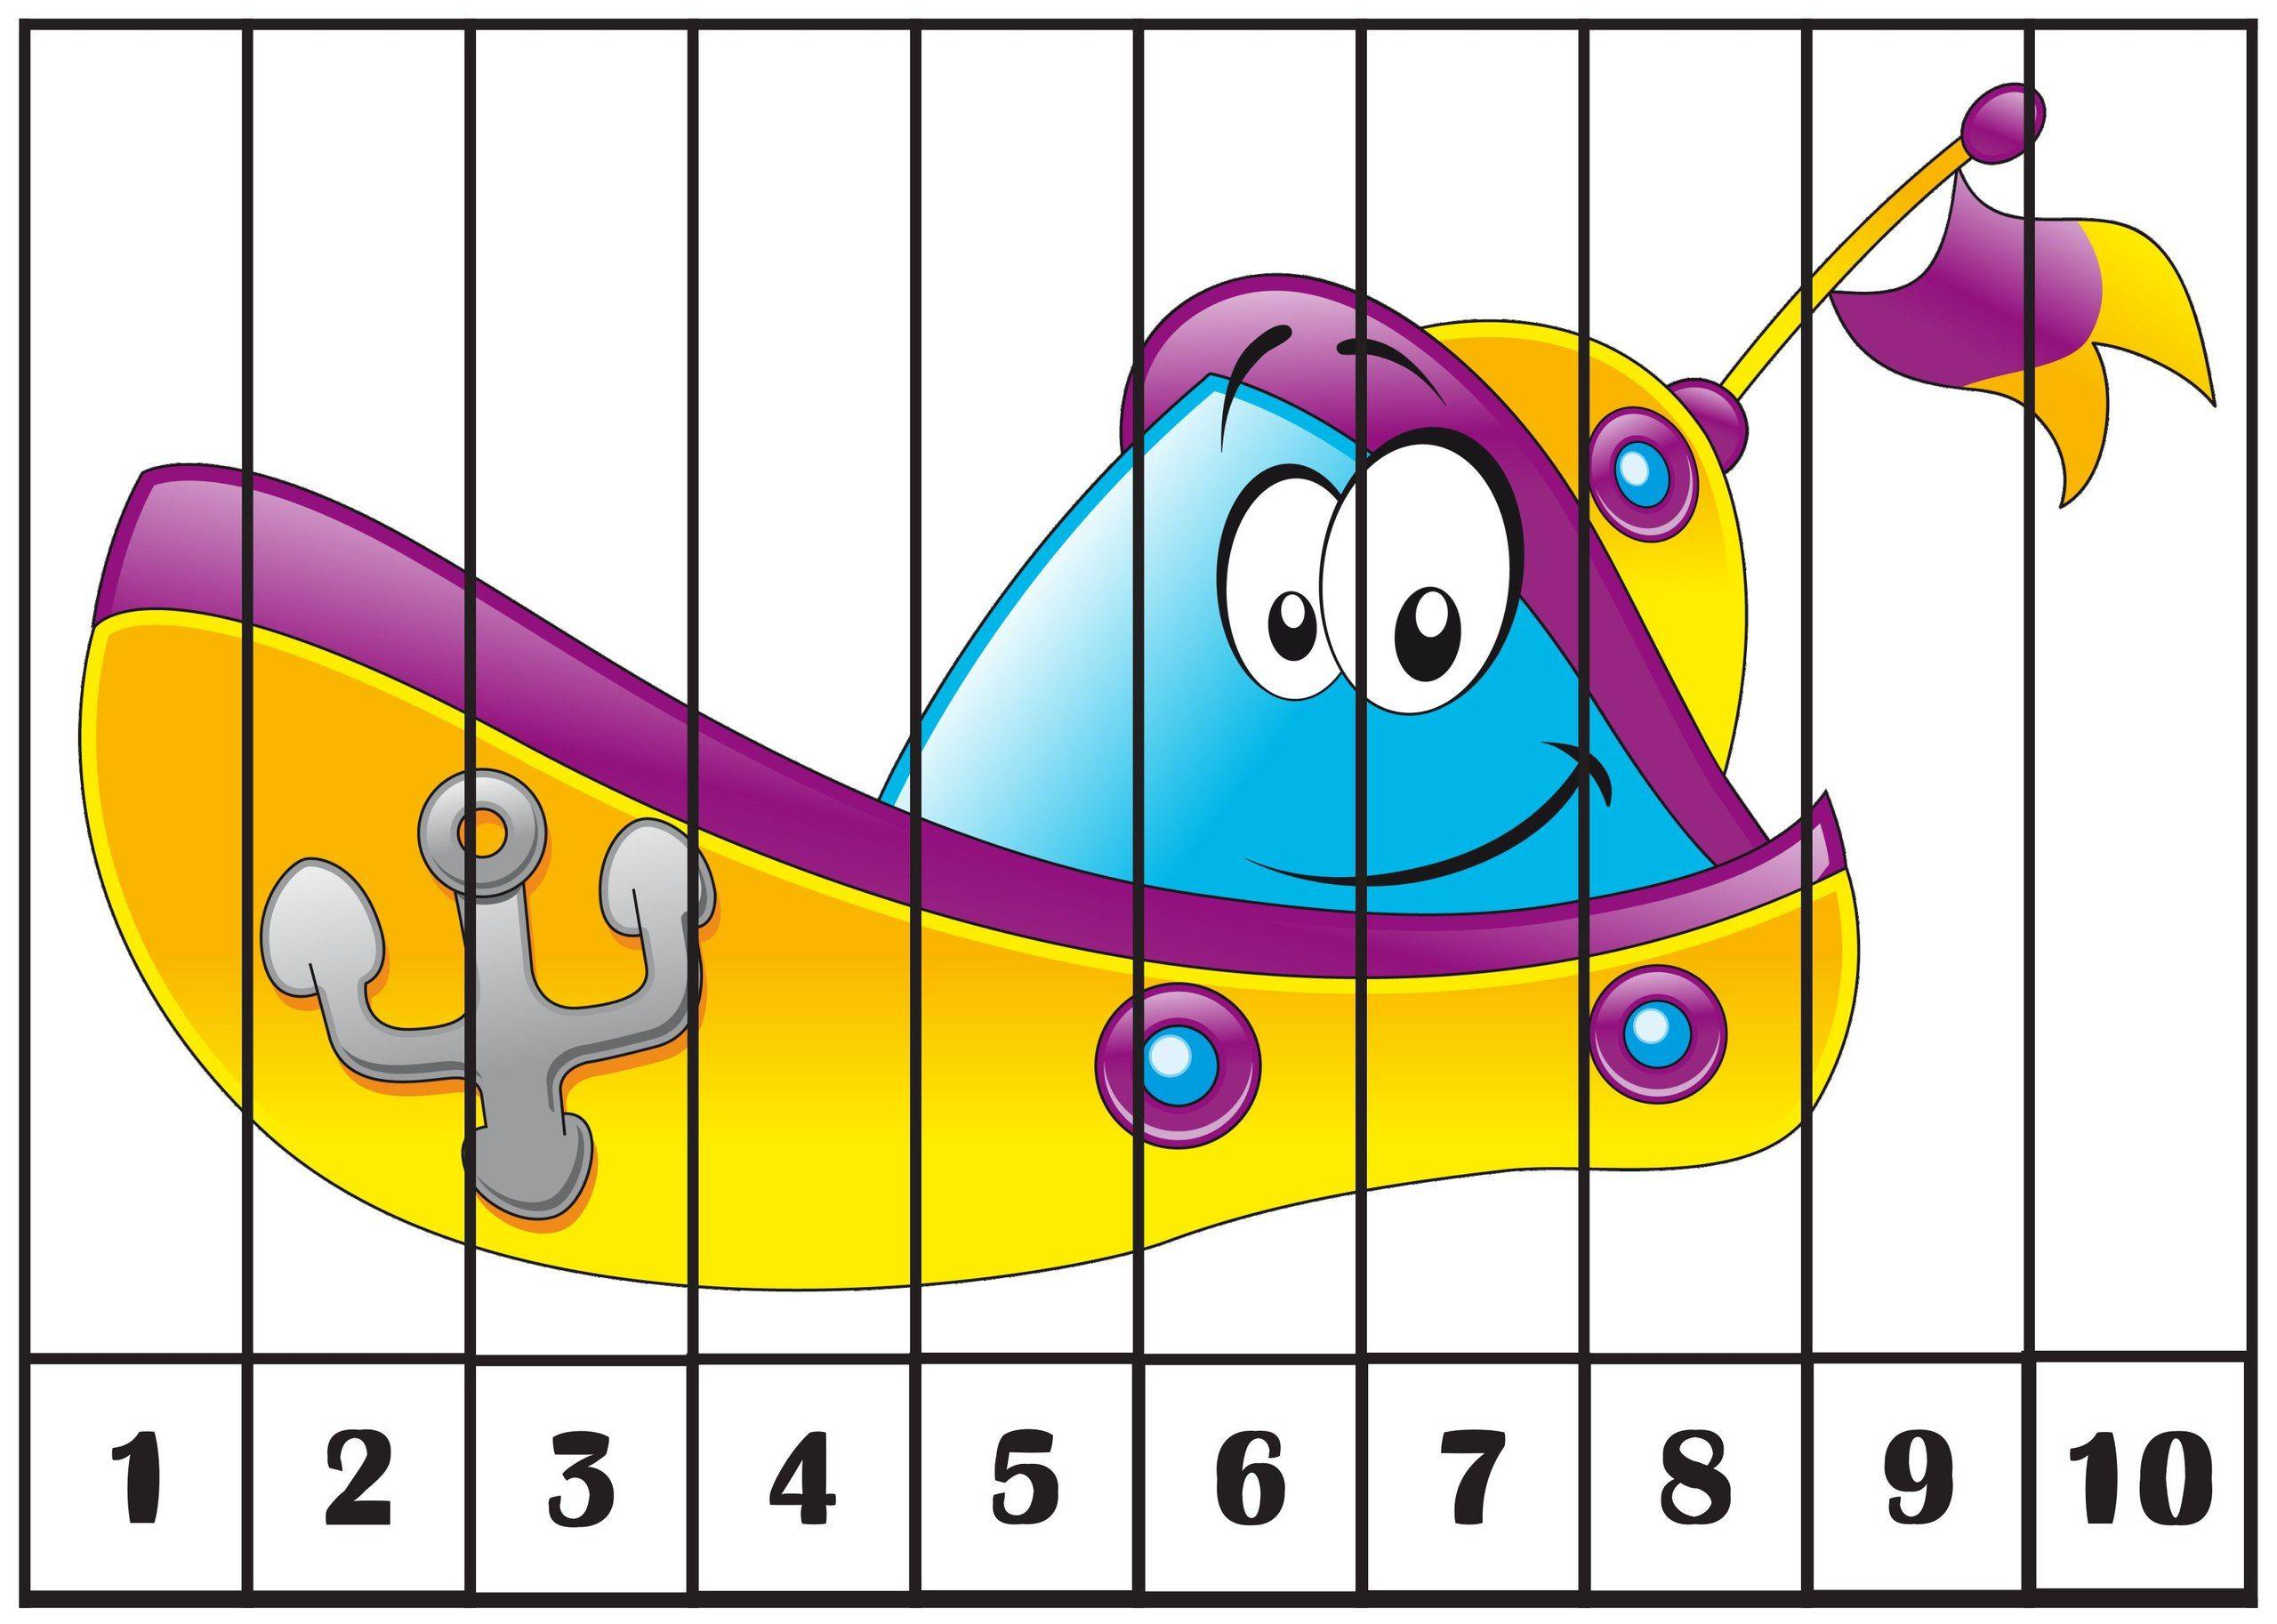 Pin Ad Ugat De Prekautism Pe Number Games Amp Activities For Children With Autism